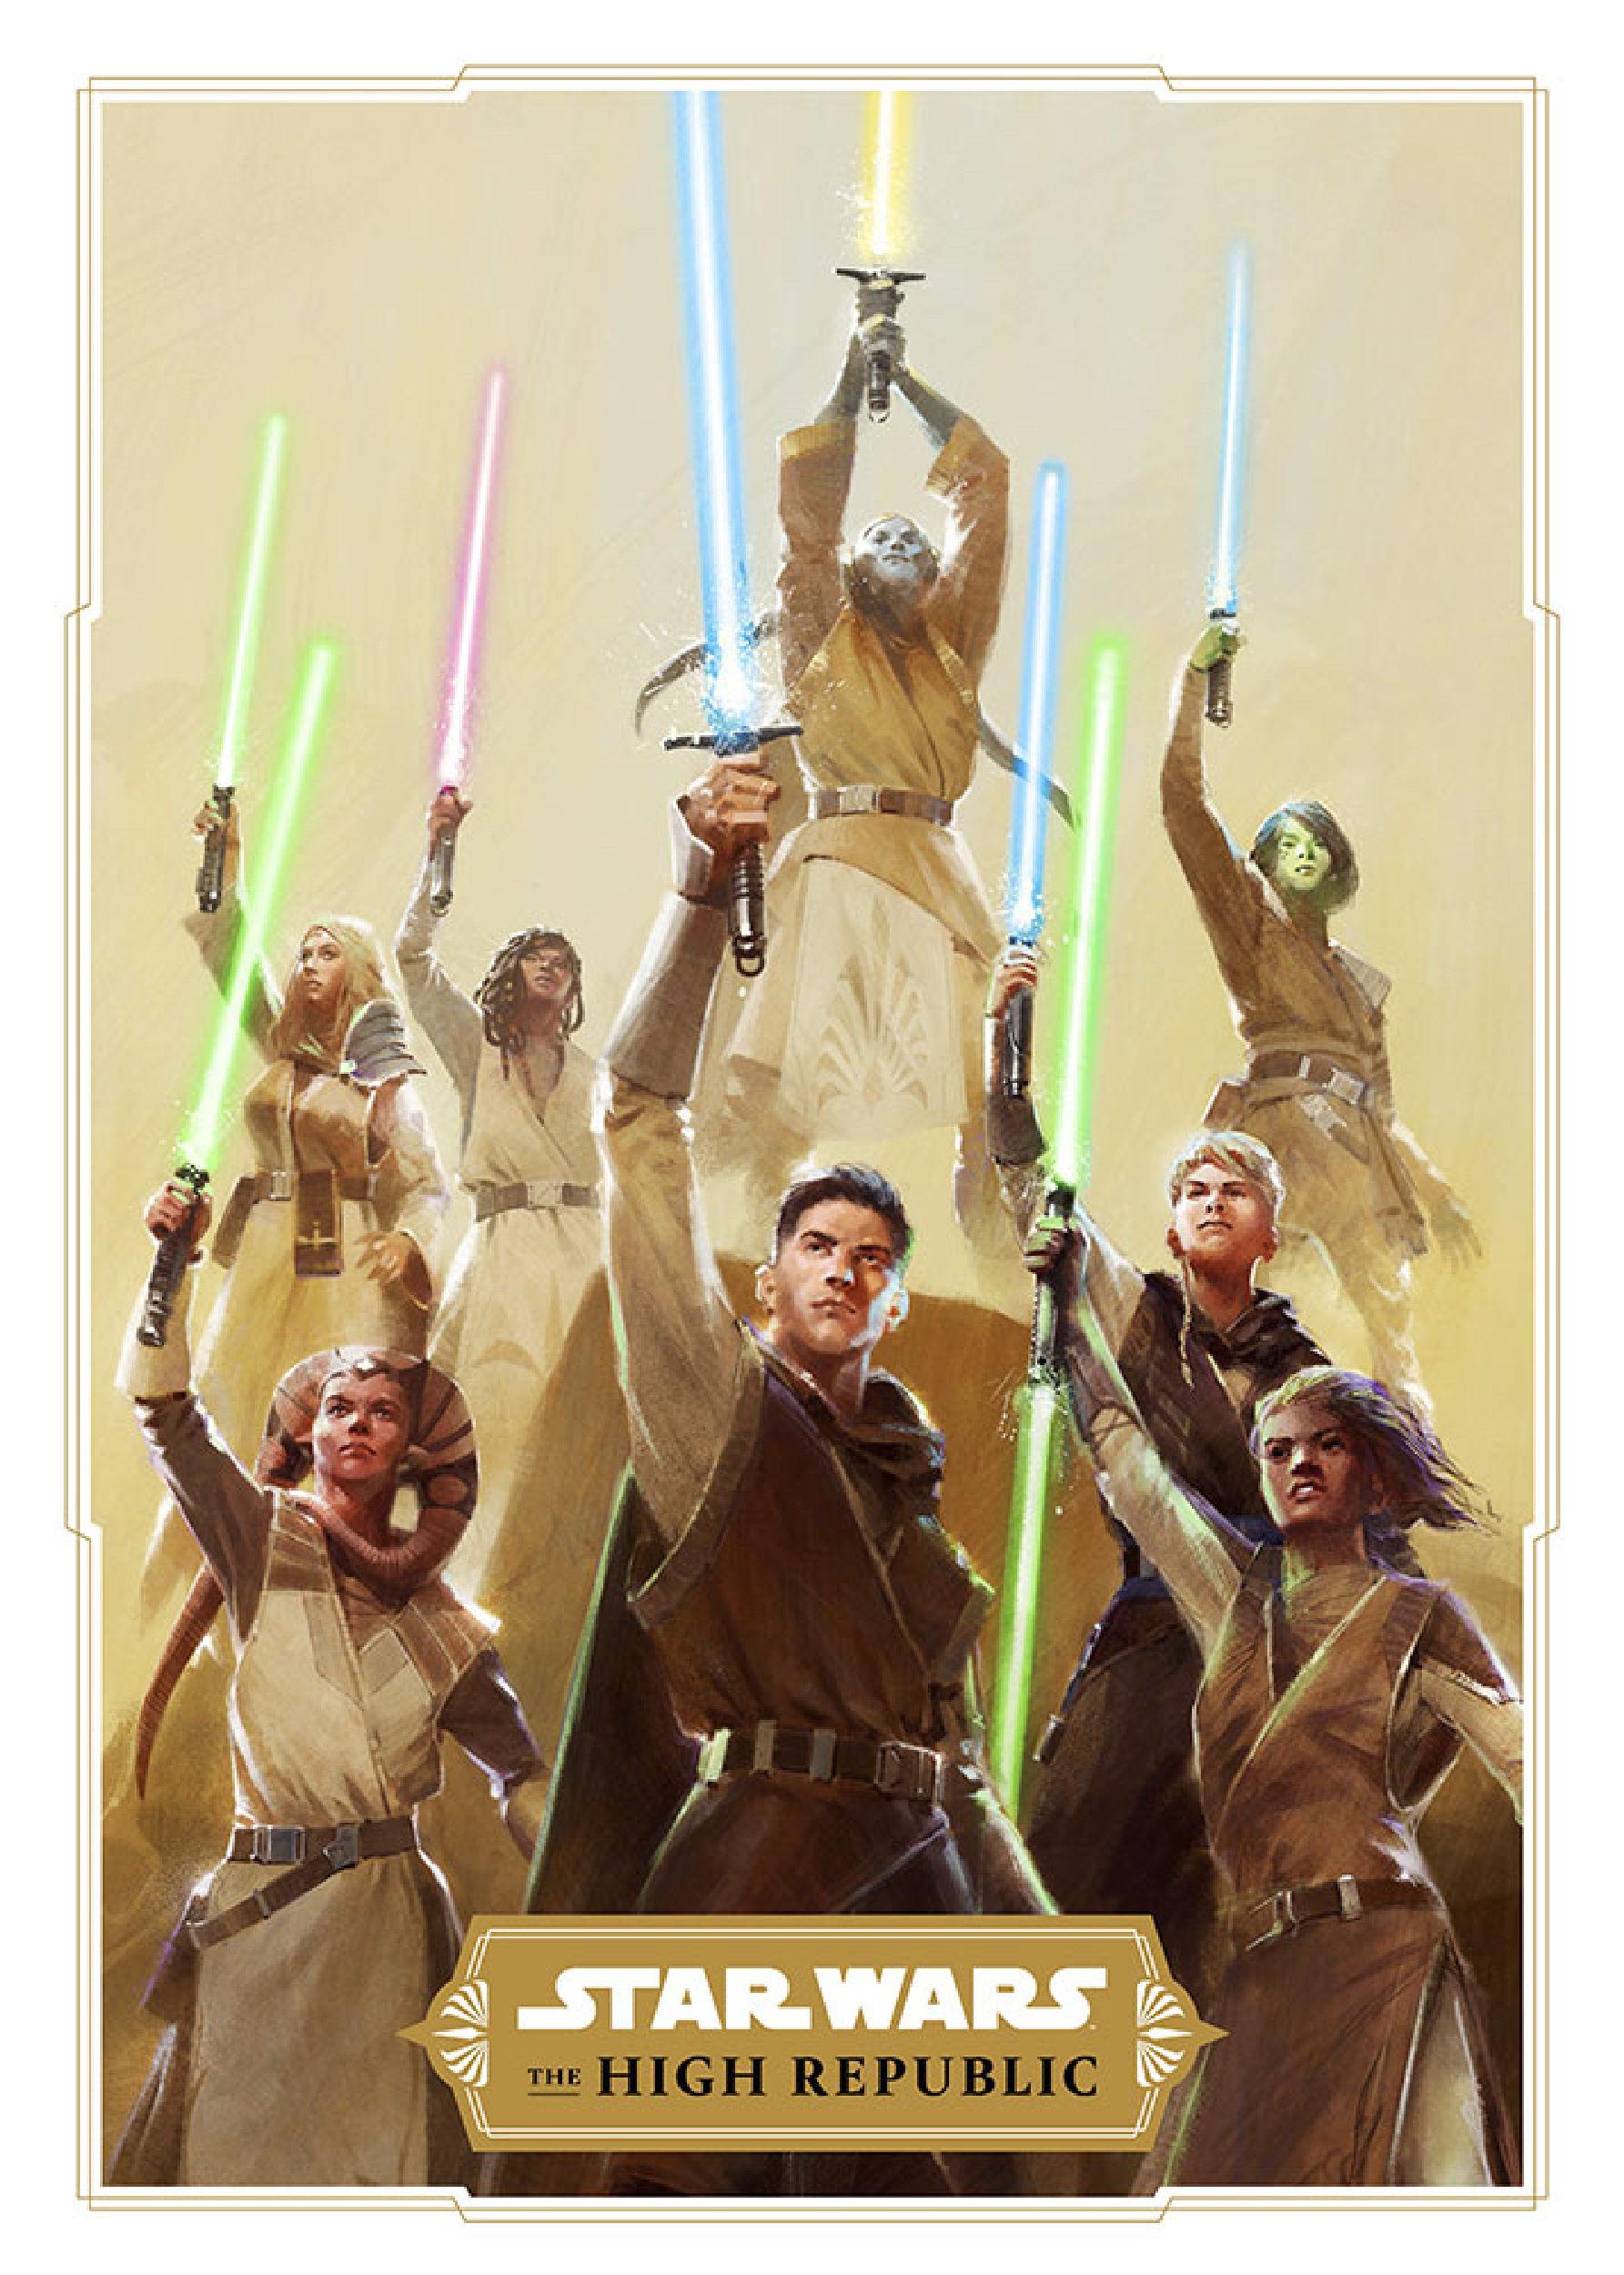 Jedi looking sharp